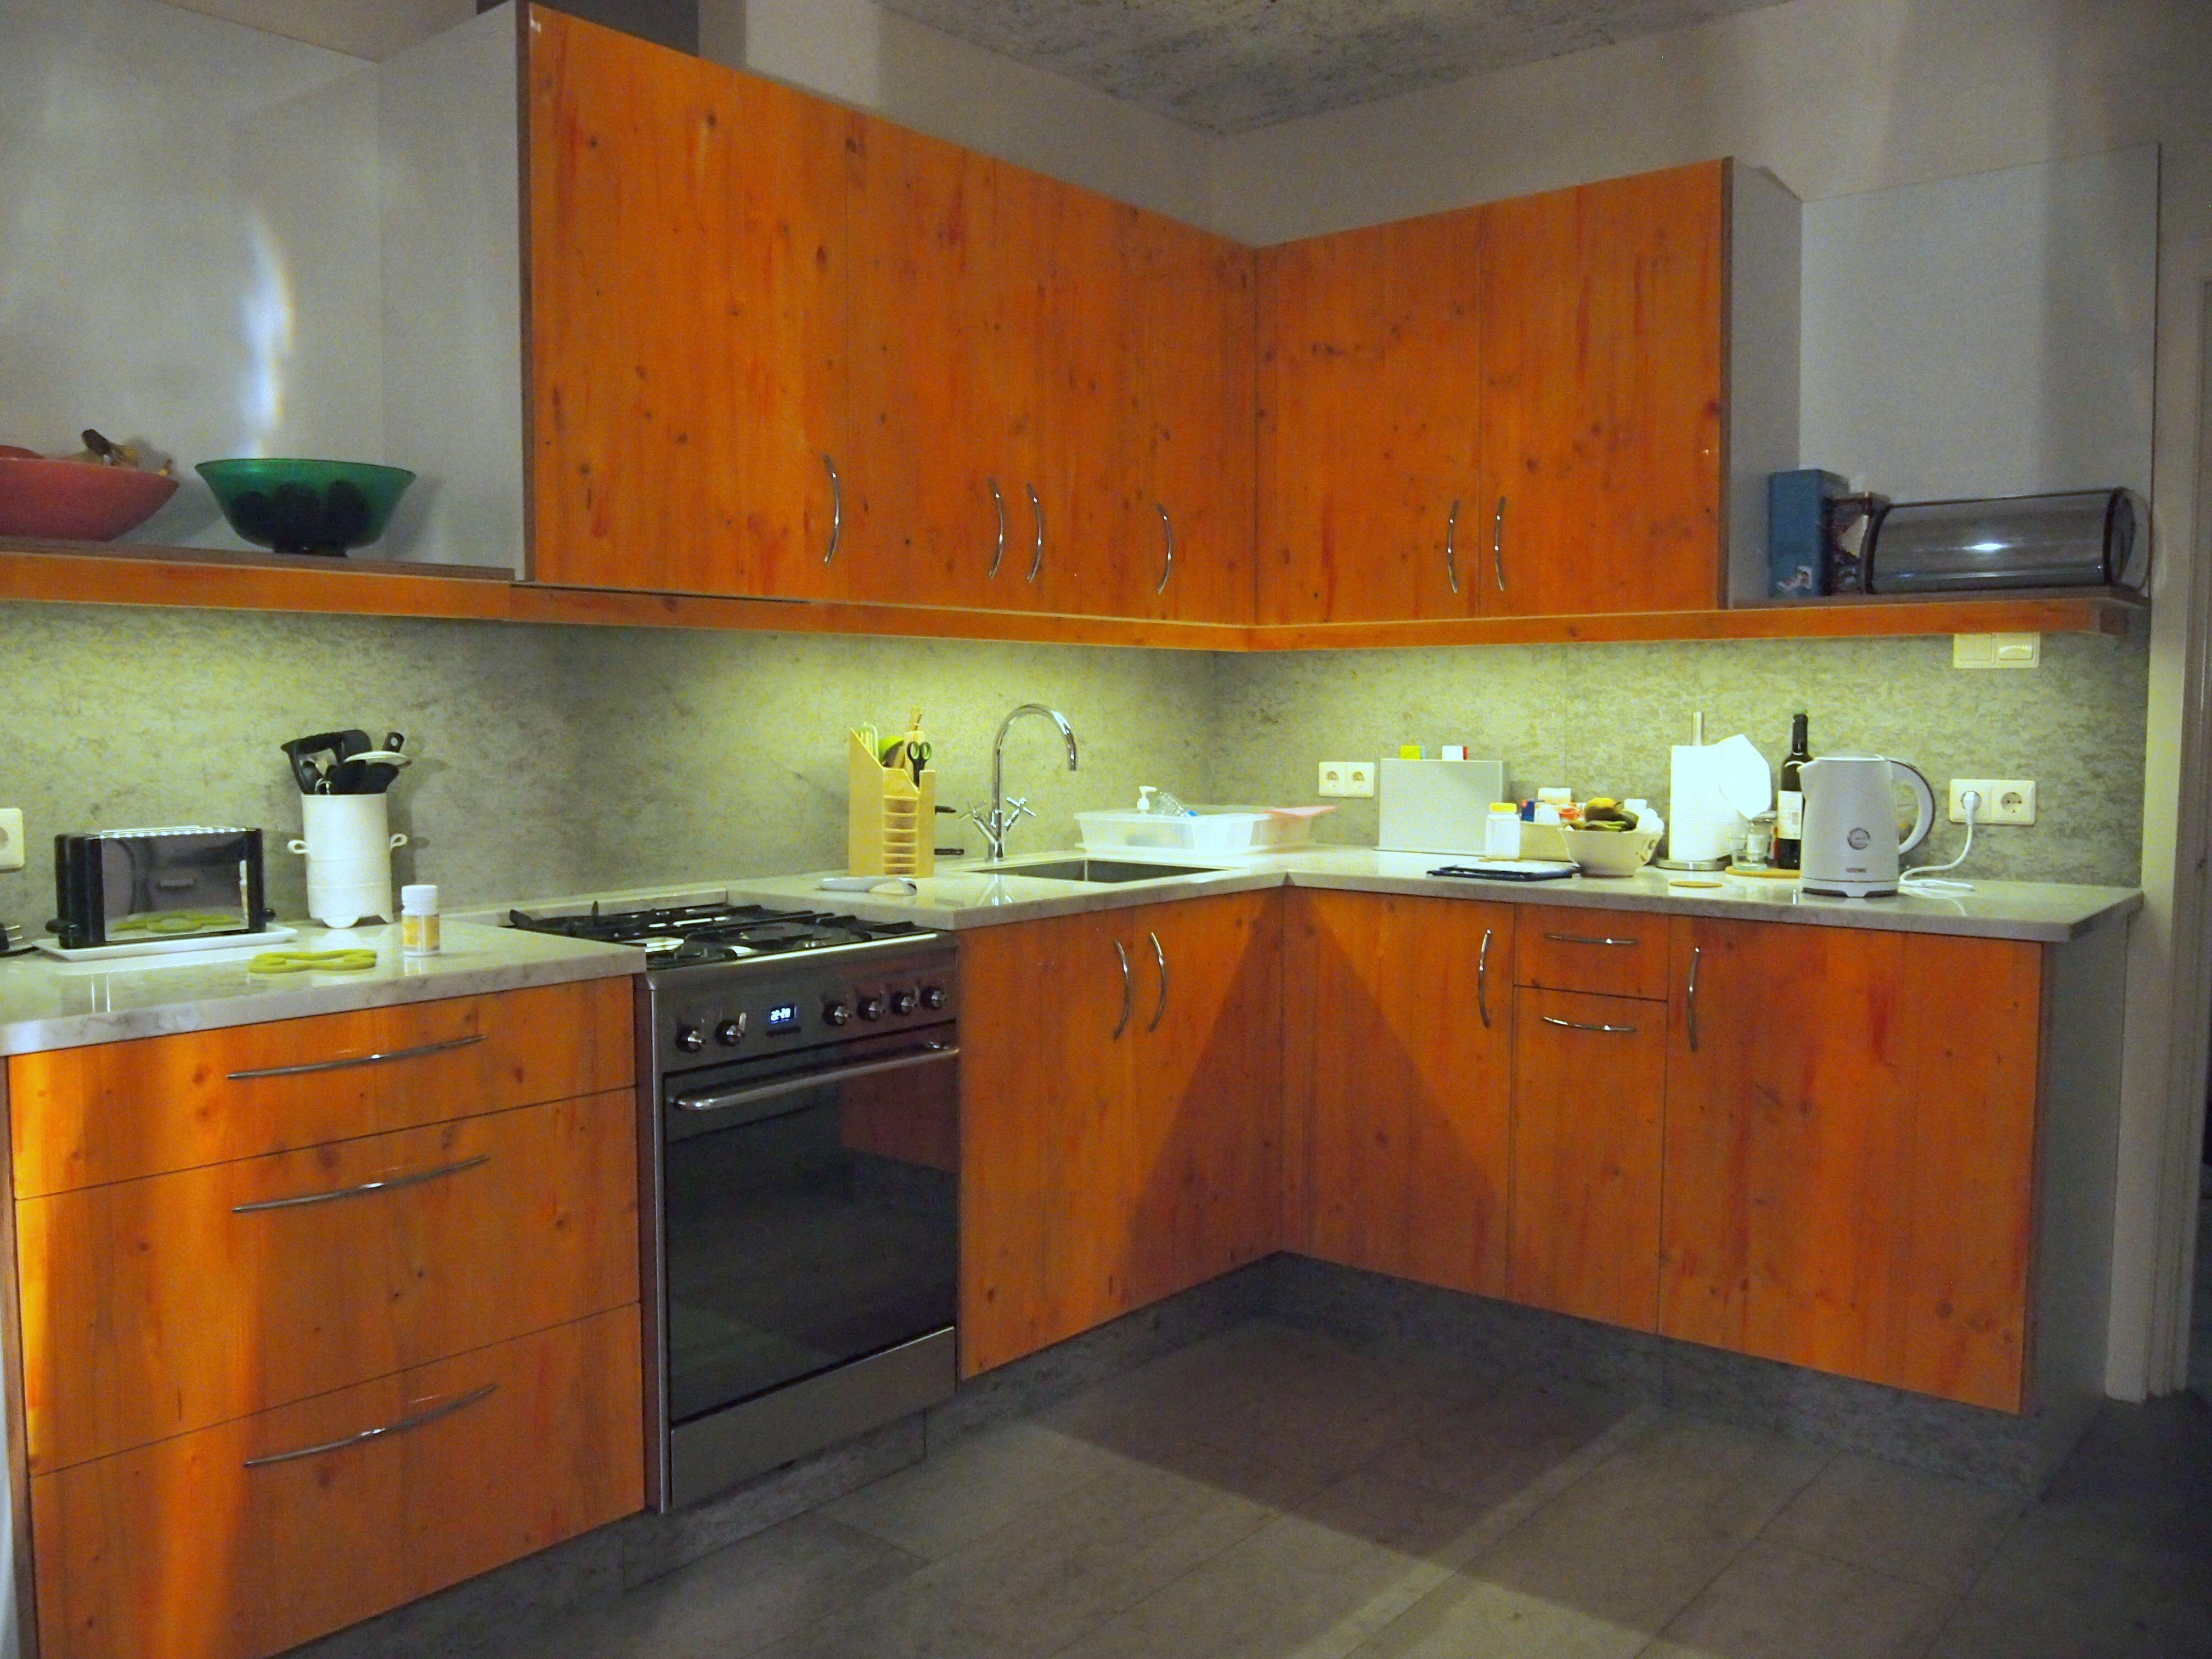 Royal Orange Colour Coating on kitchen Cabinets www.ccoating.nl ...